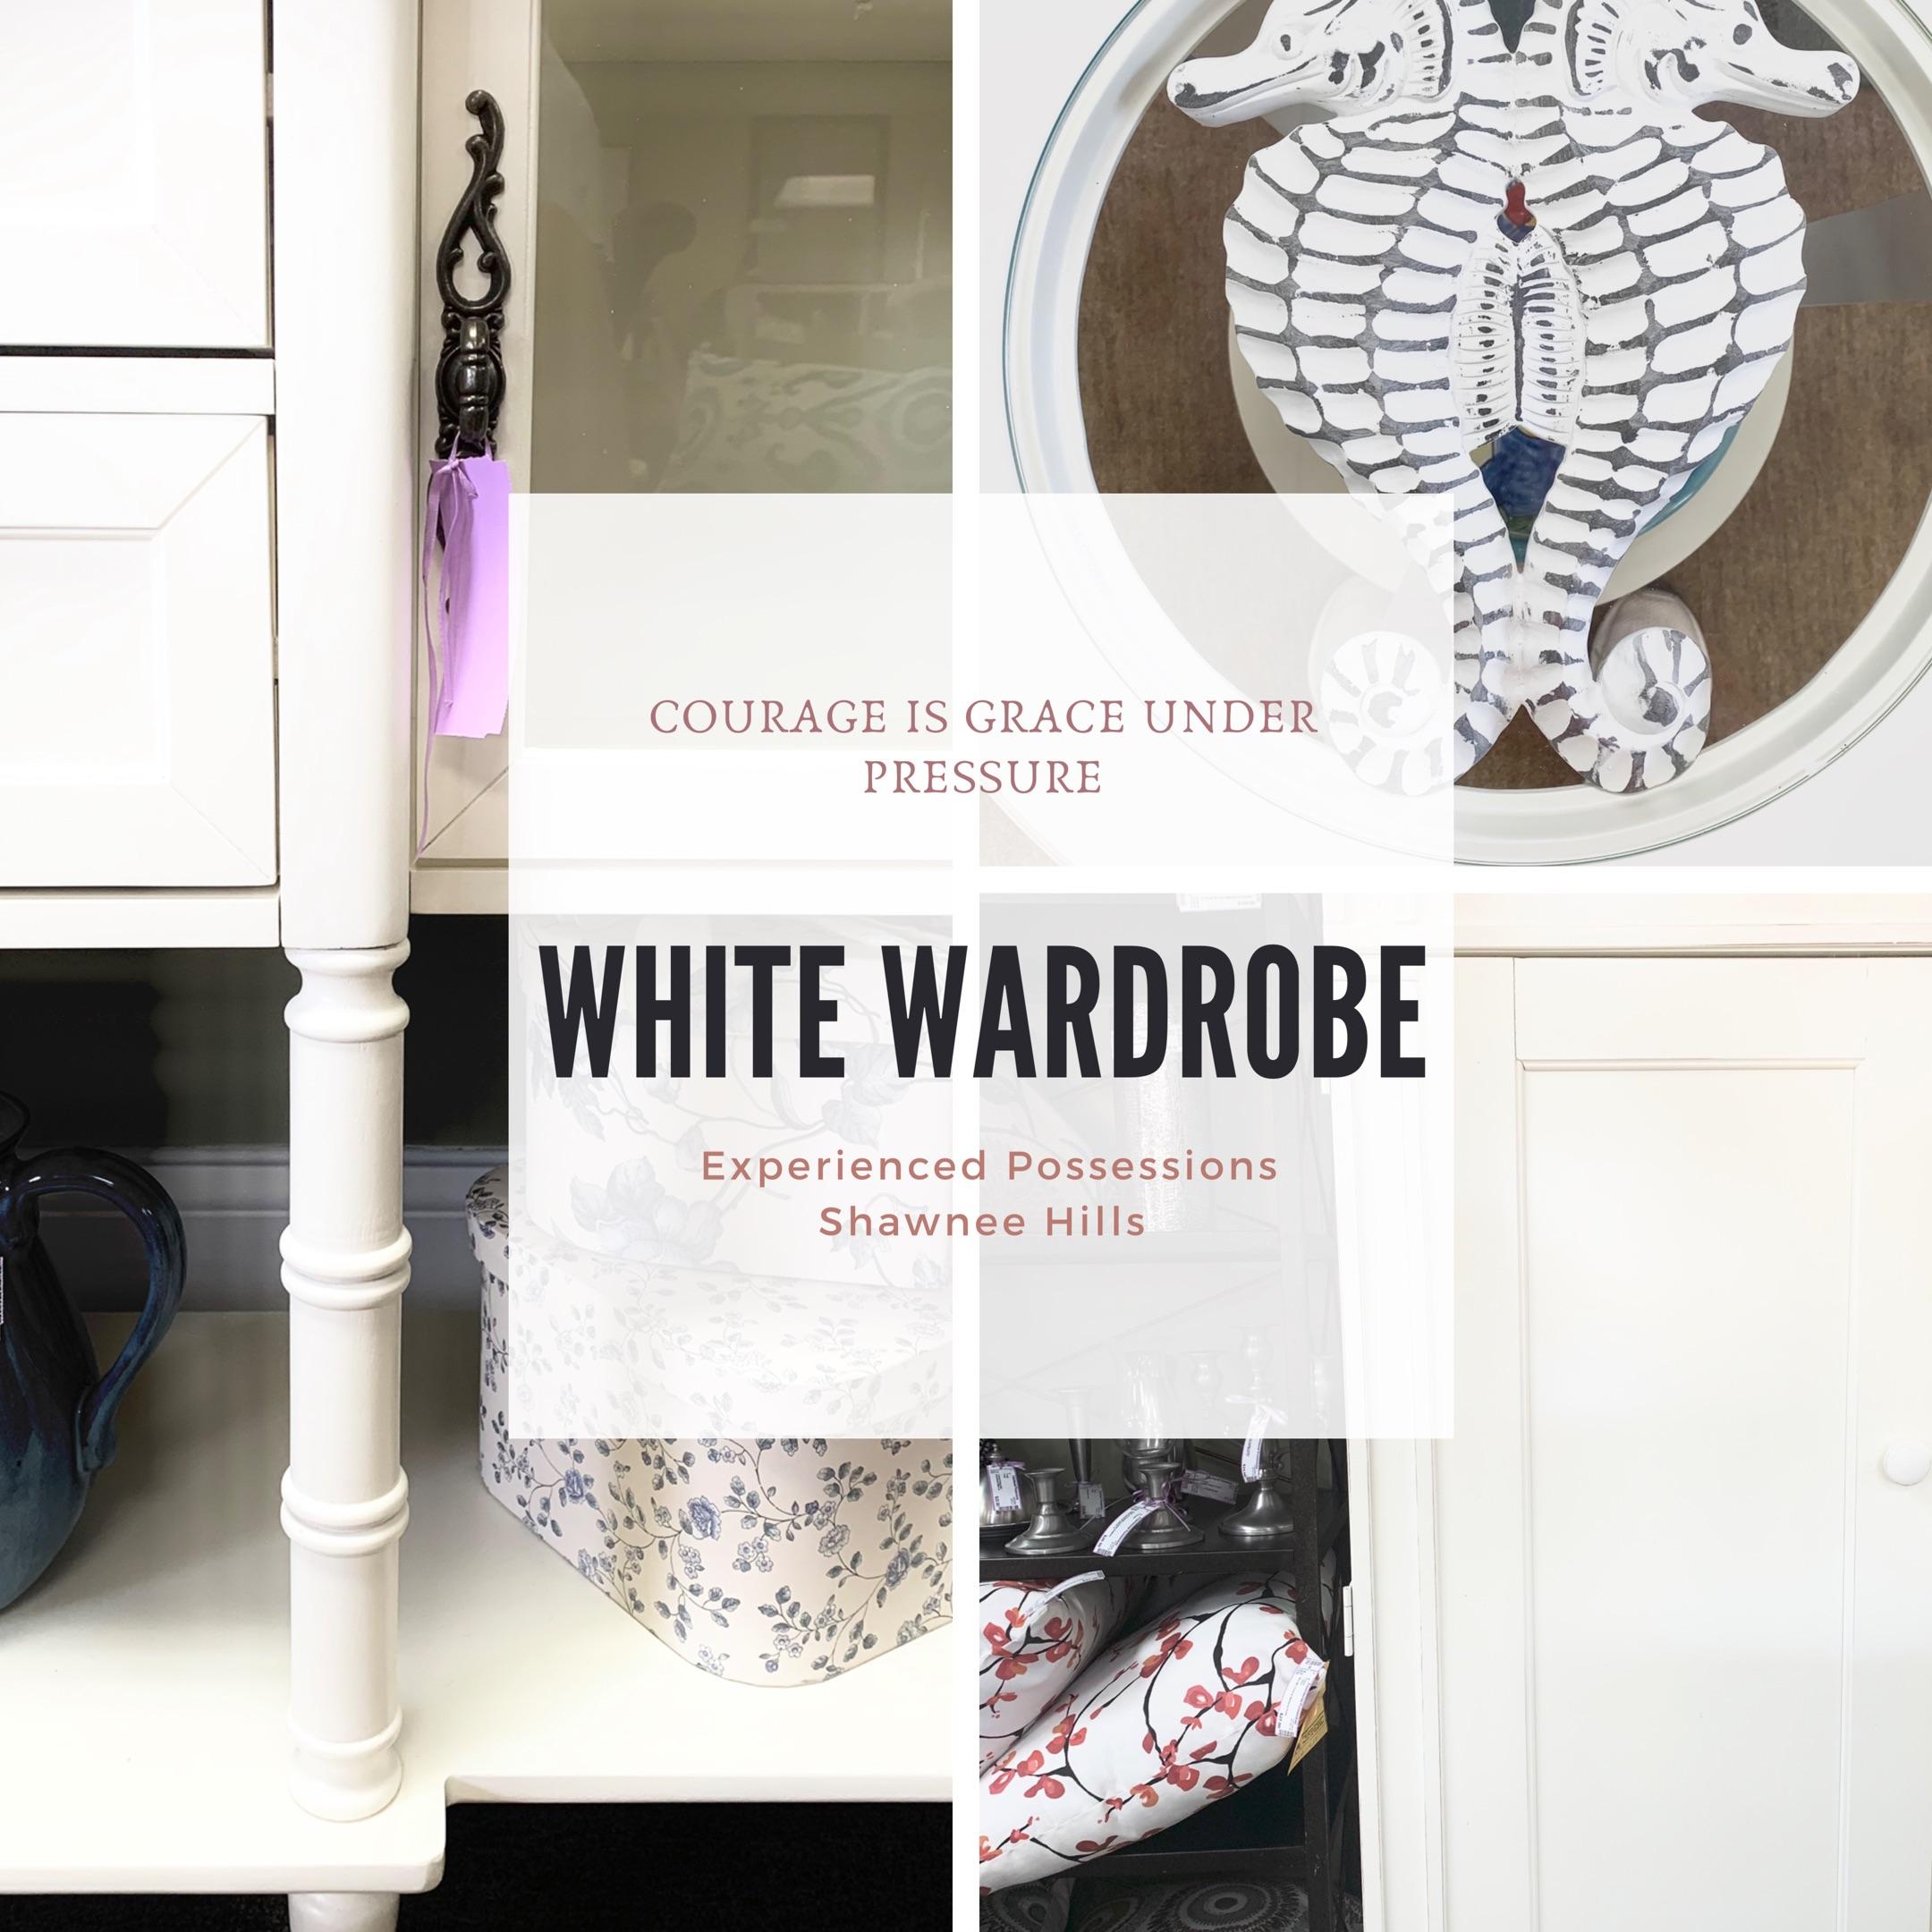 White wardrobe.jpeg